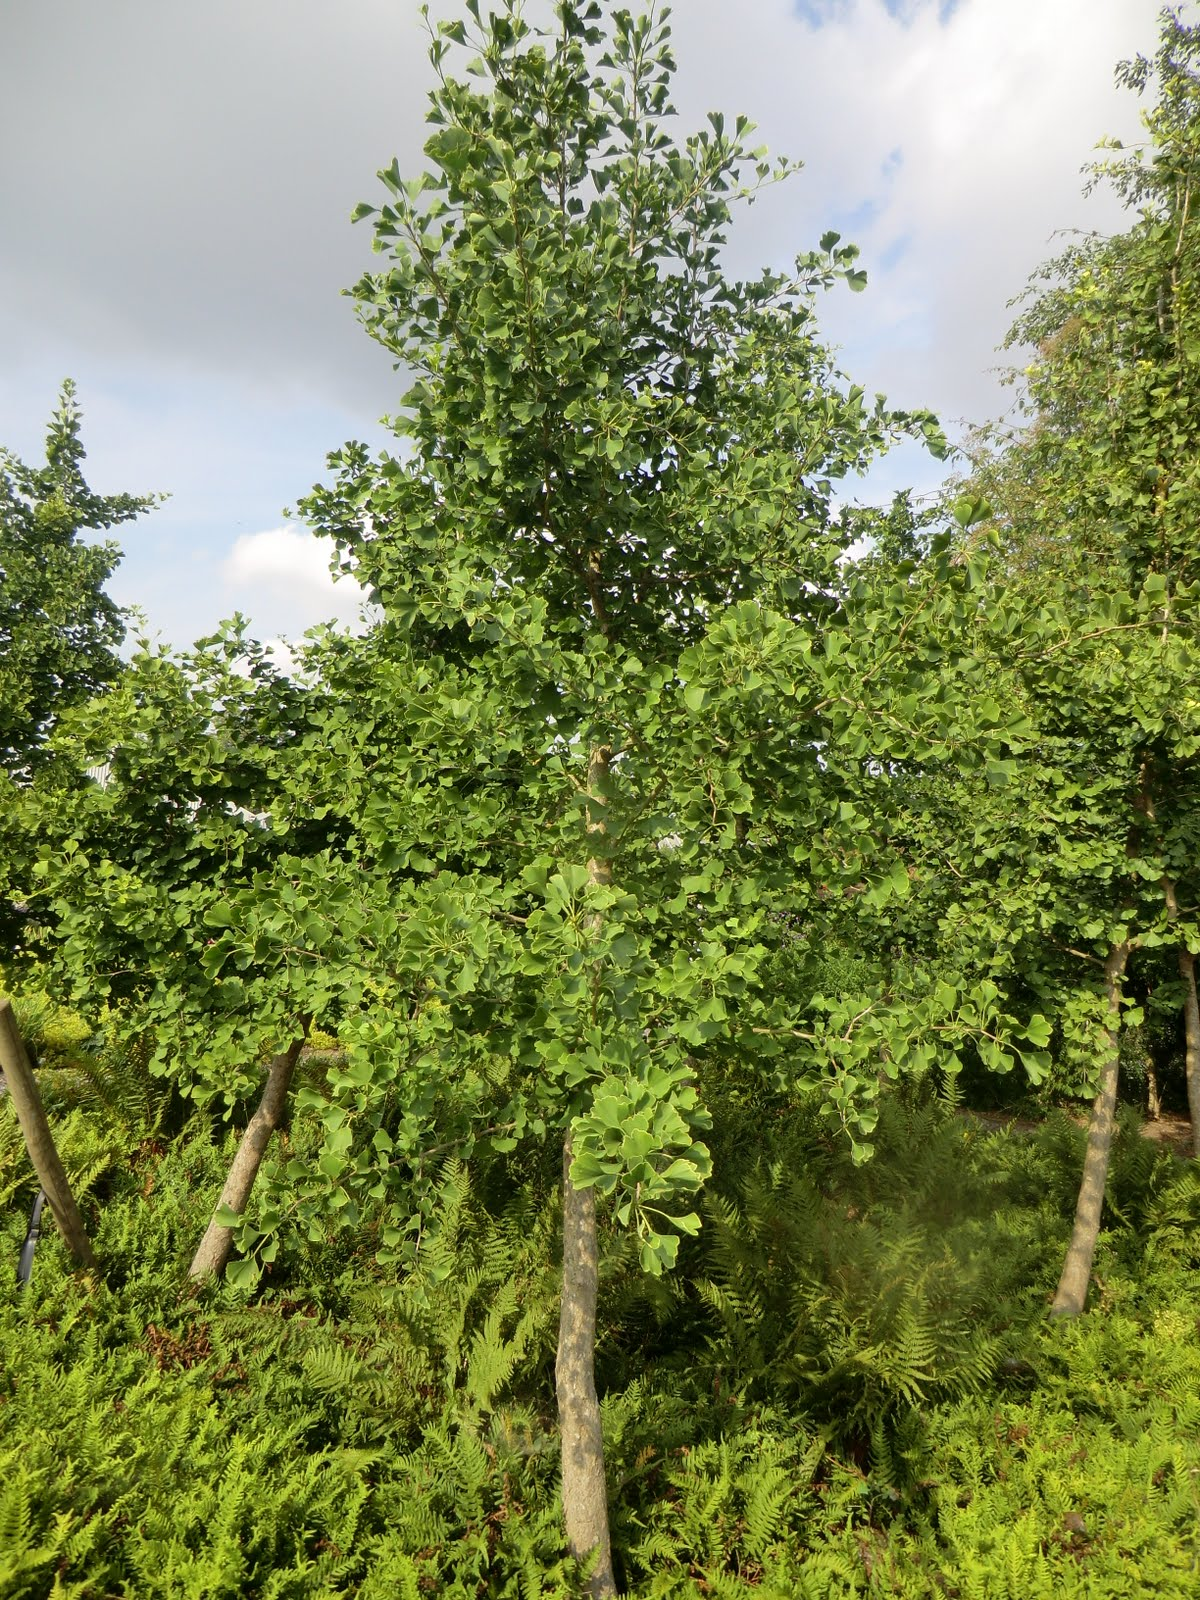 CIMG2746 Ginkgo biloba trees, Broadview Gardens